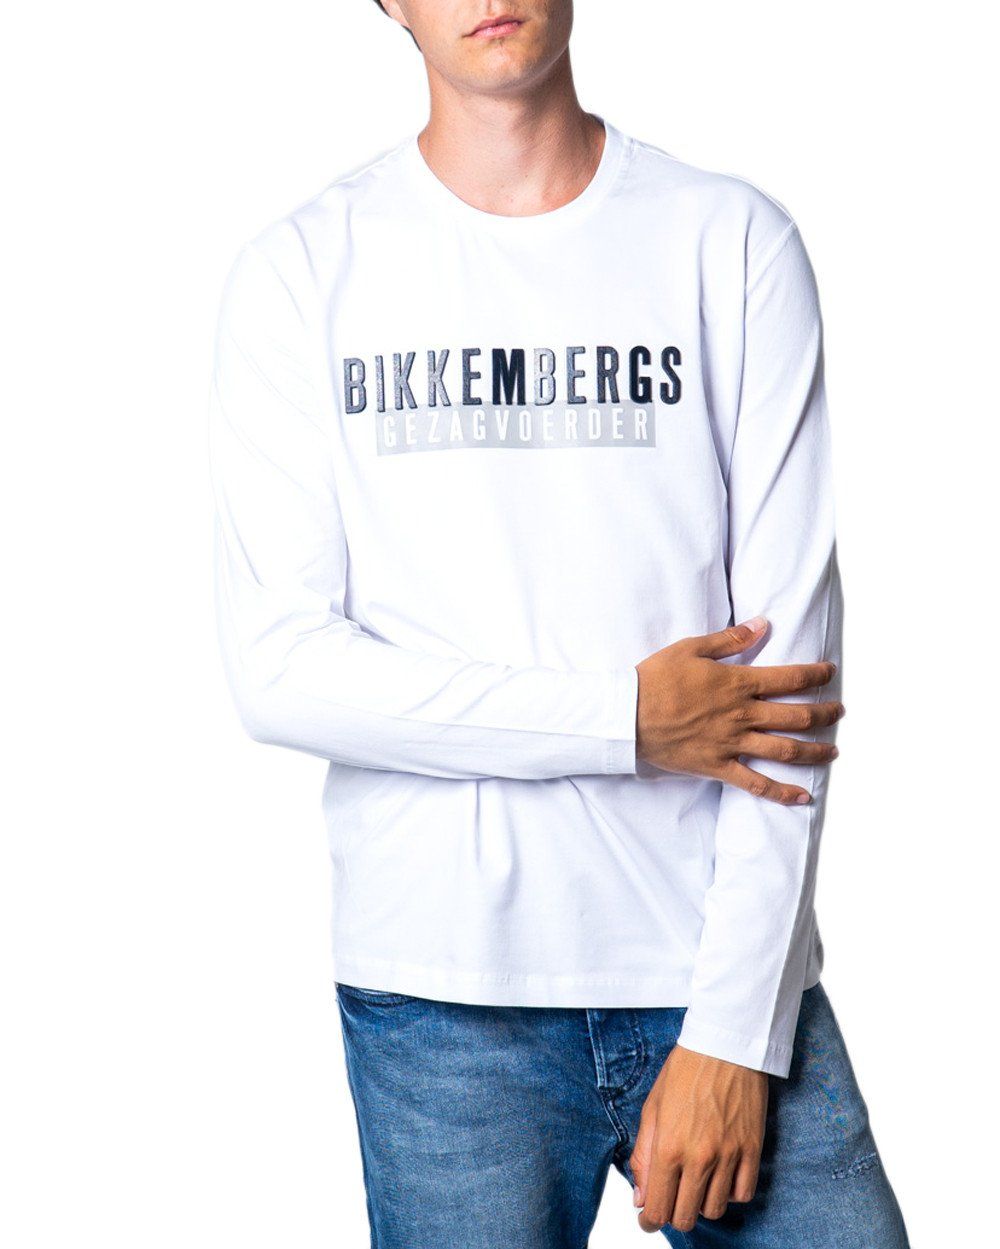 Bikkembergs Men's T-Shirt Various Colours 175516 - white L